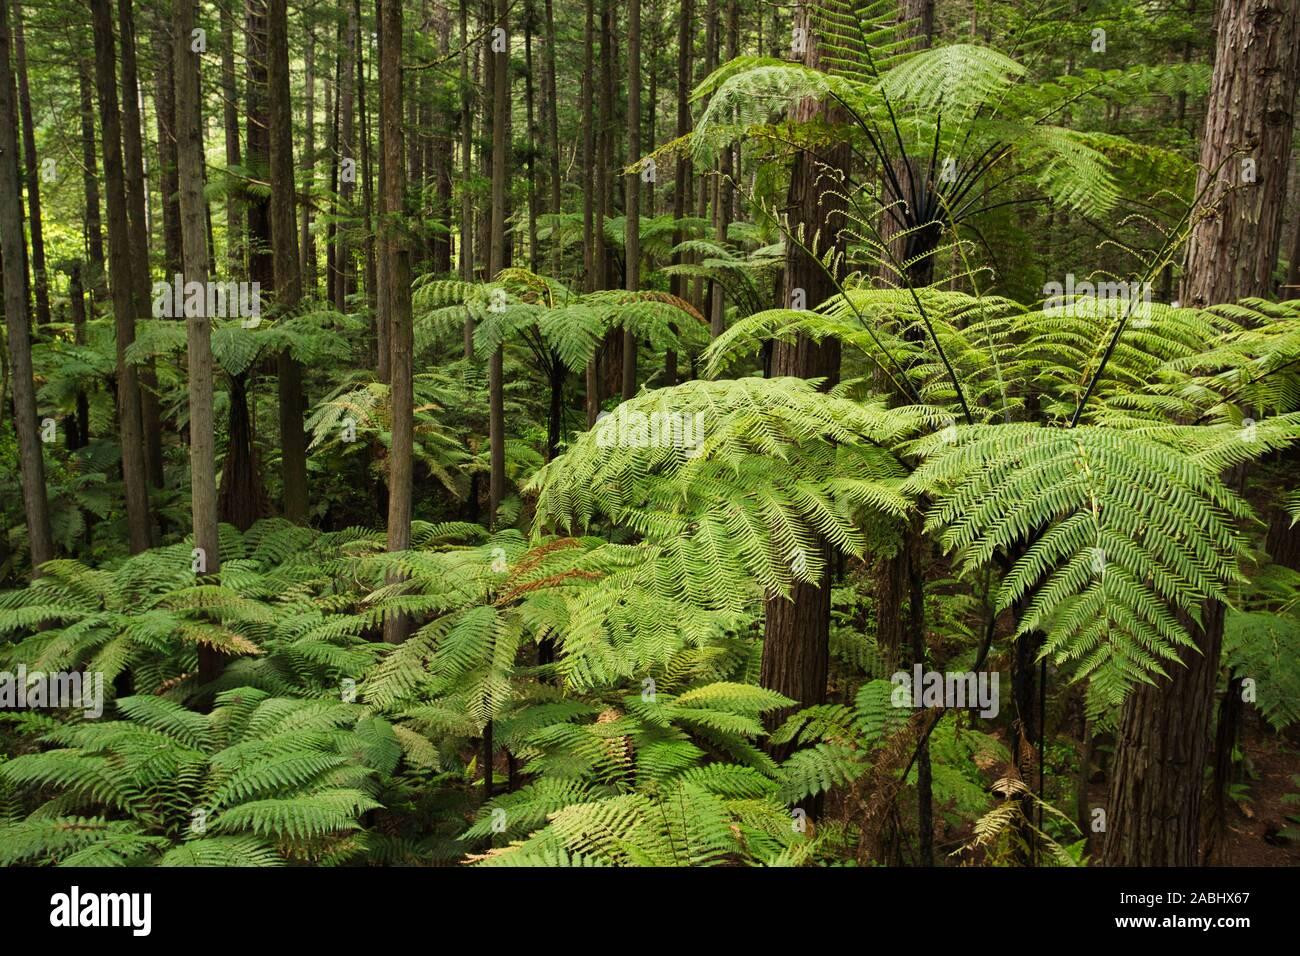 Forest of Tree Ferns and Giant Redwoods in Whakarewarewa Forest near Rotorua, New Zealand Stock Photo